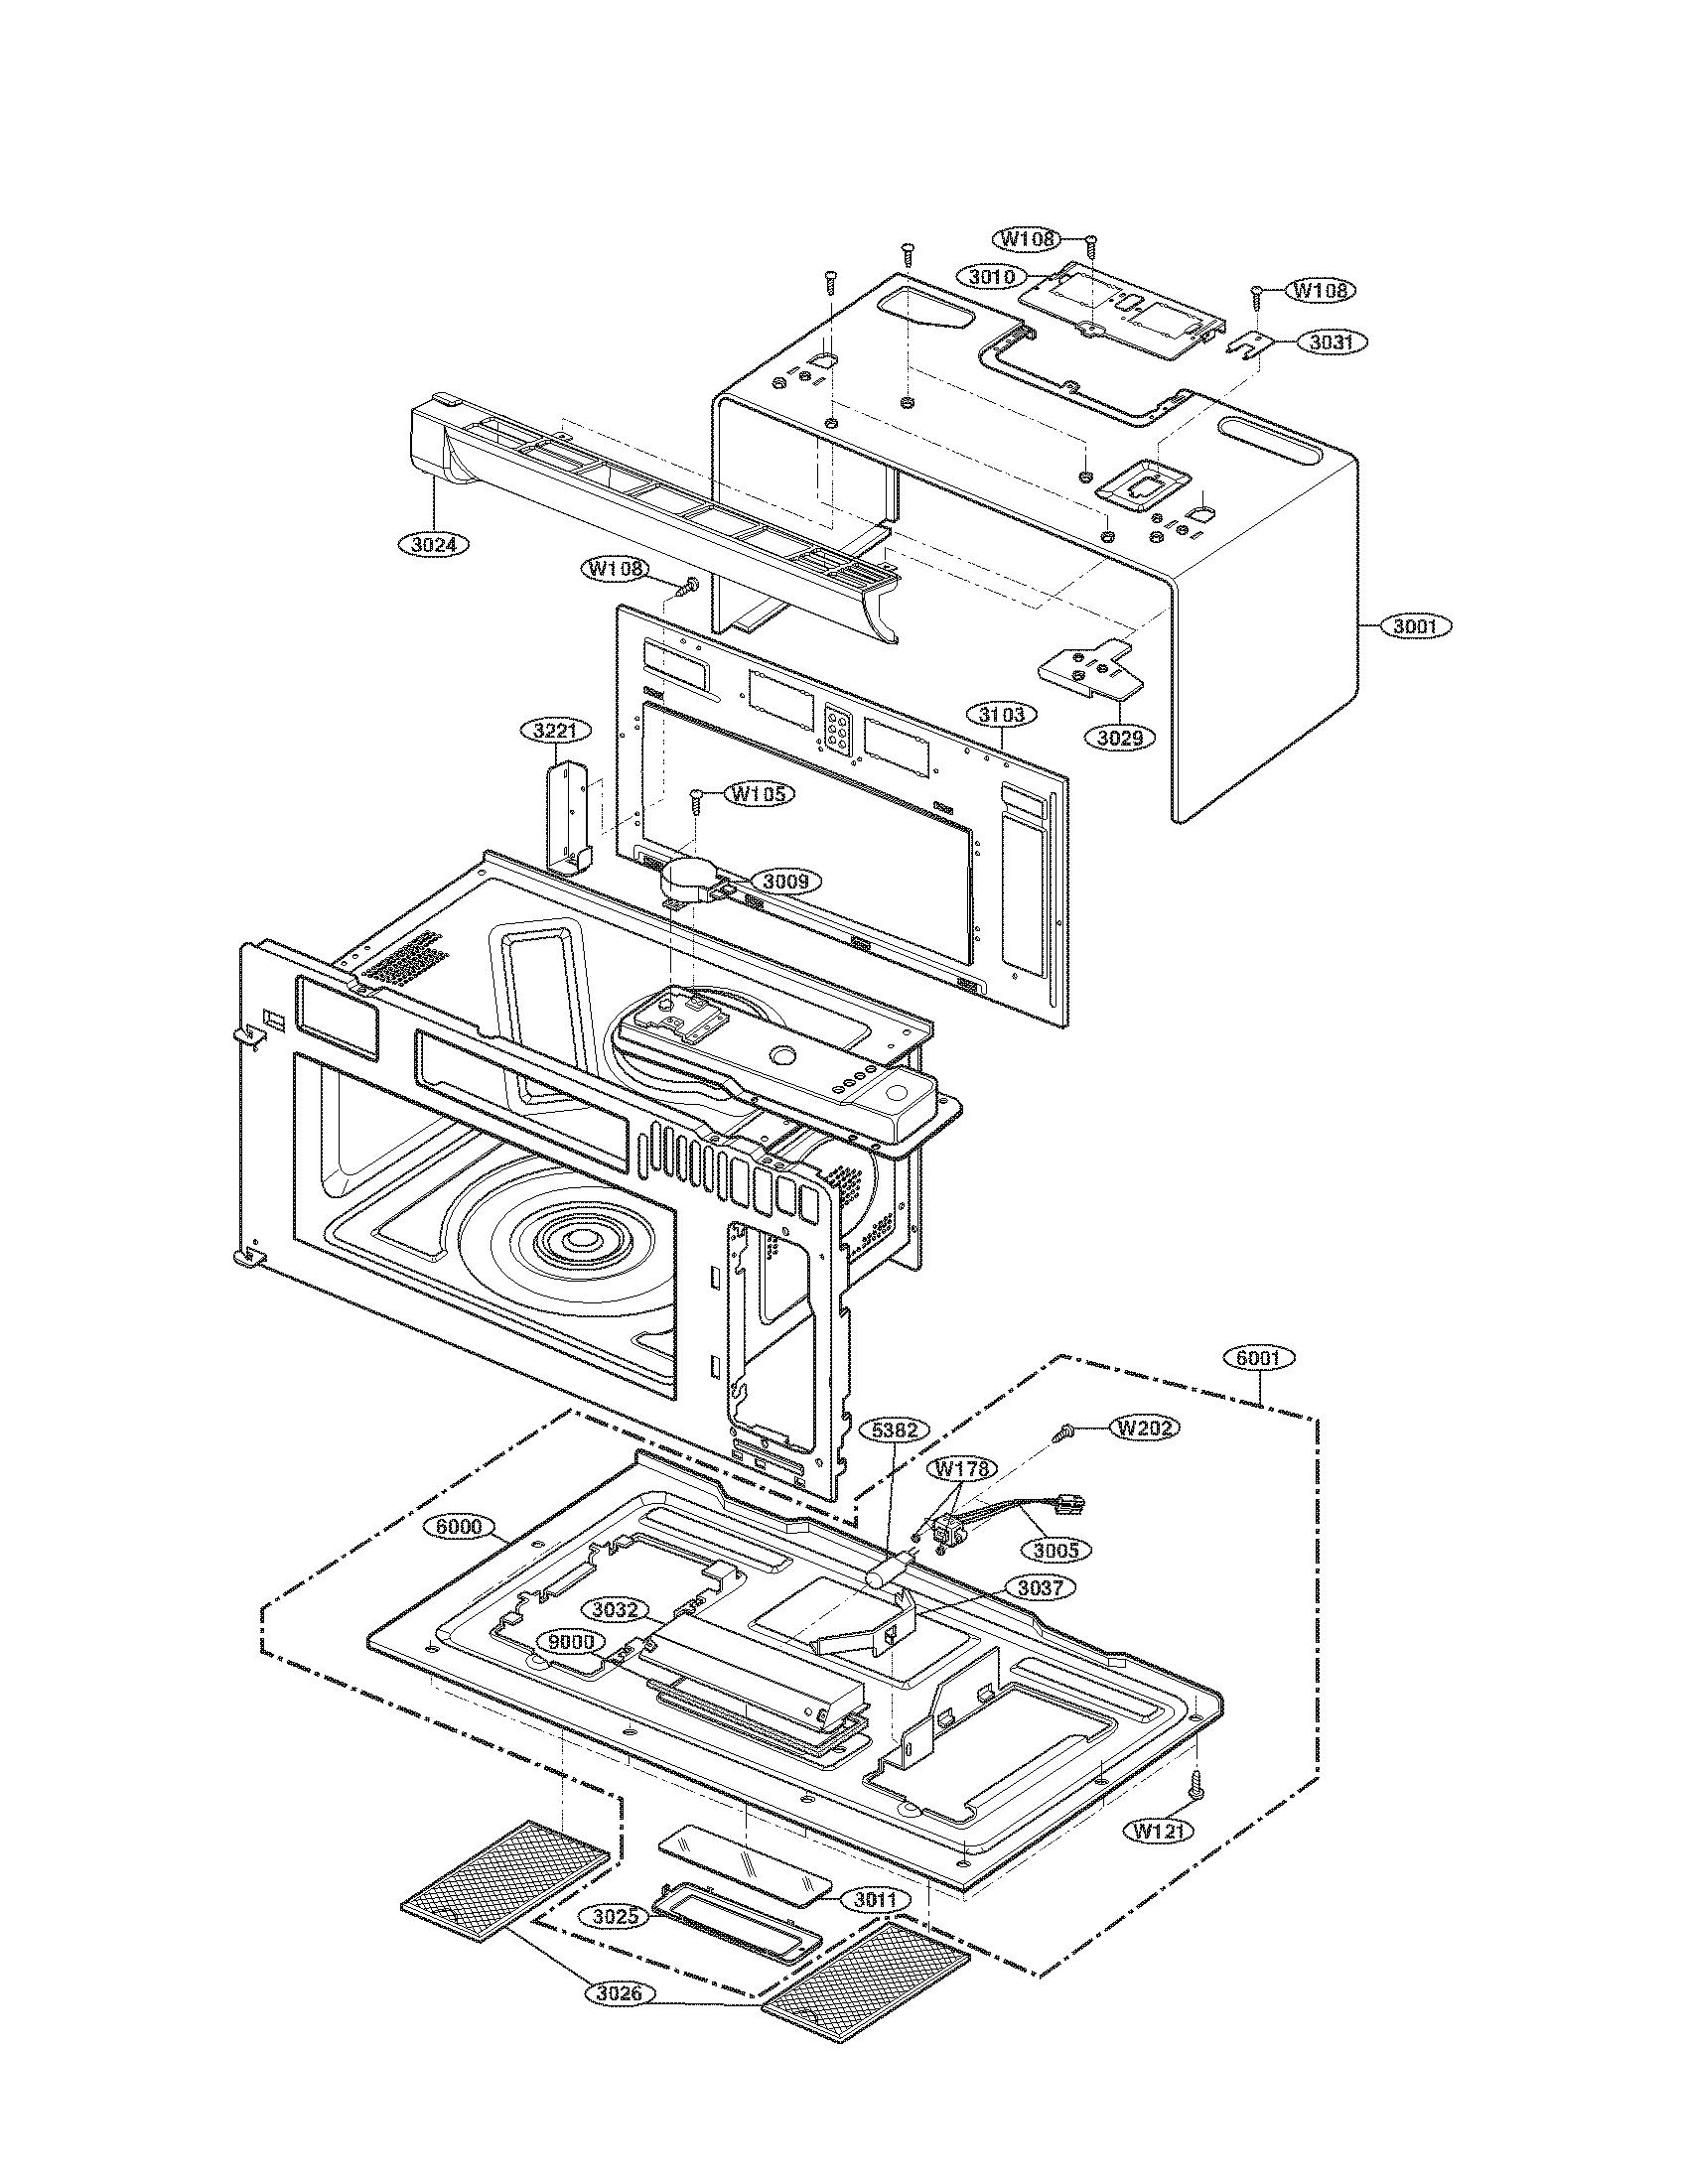 CAVITY PARTS Diagram & Parts List for Model 72188512900